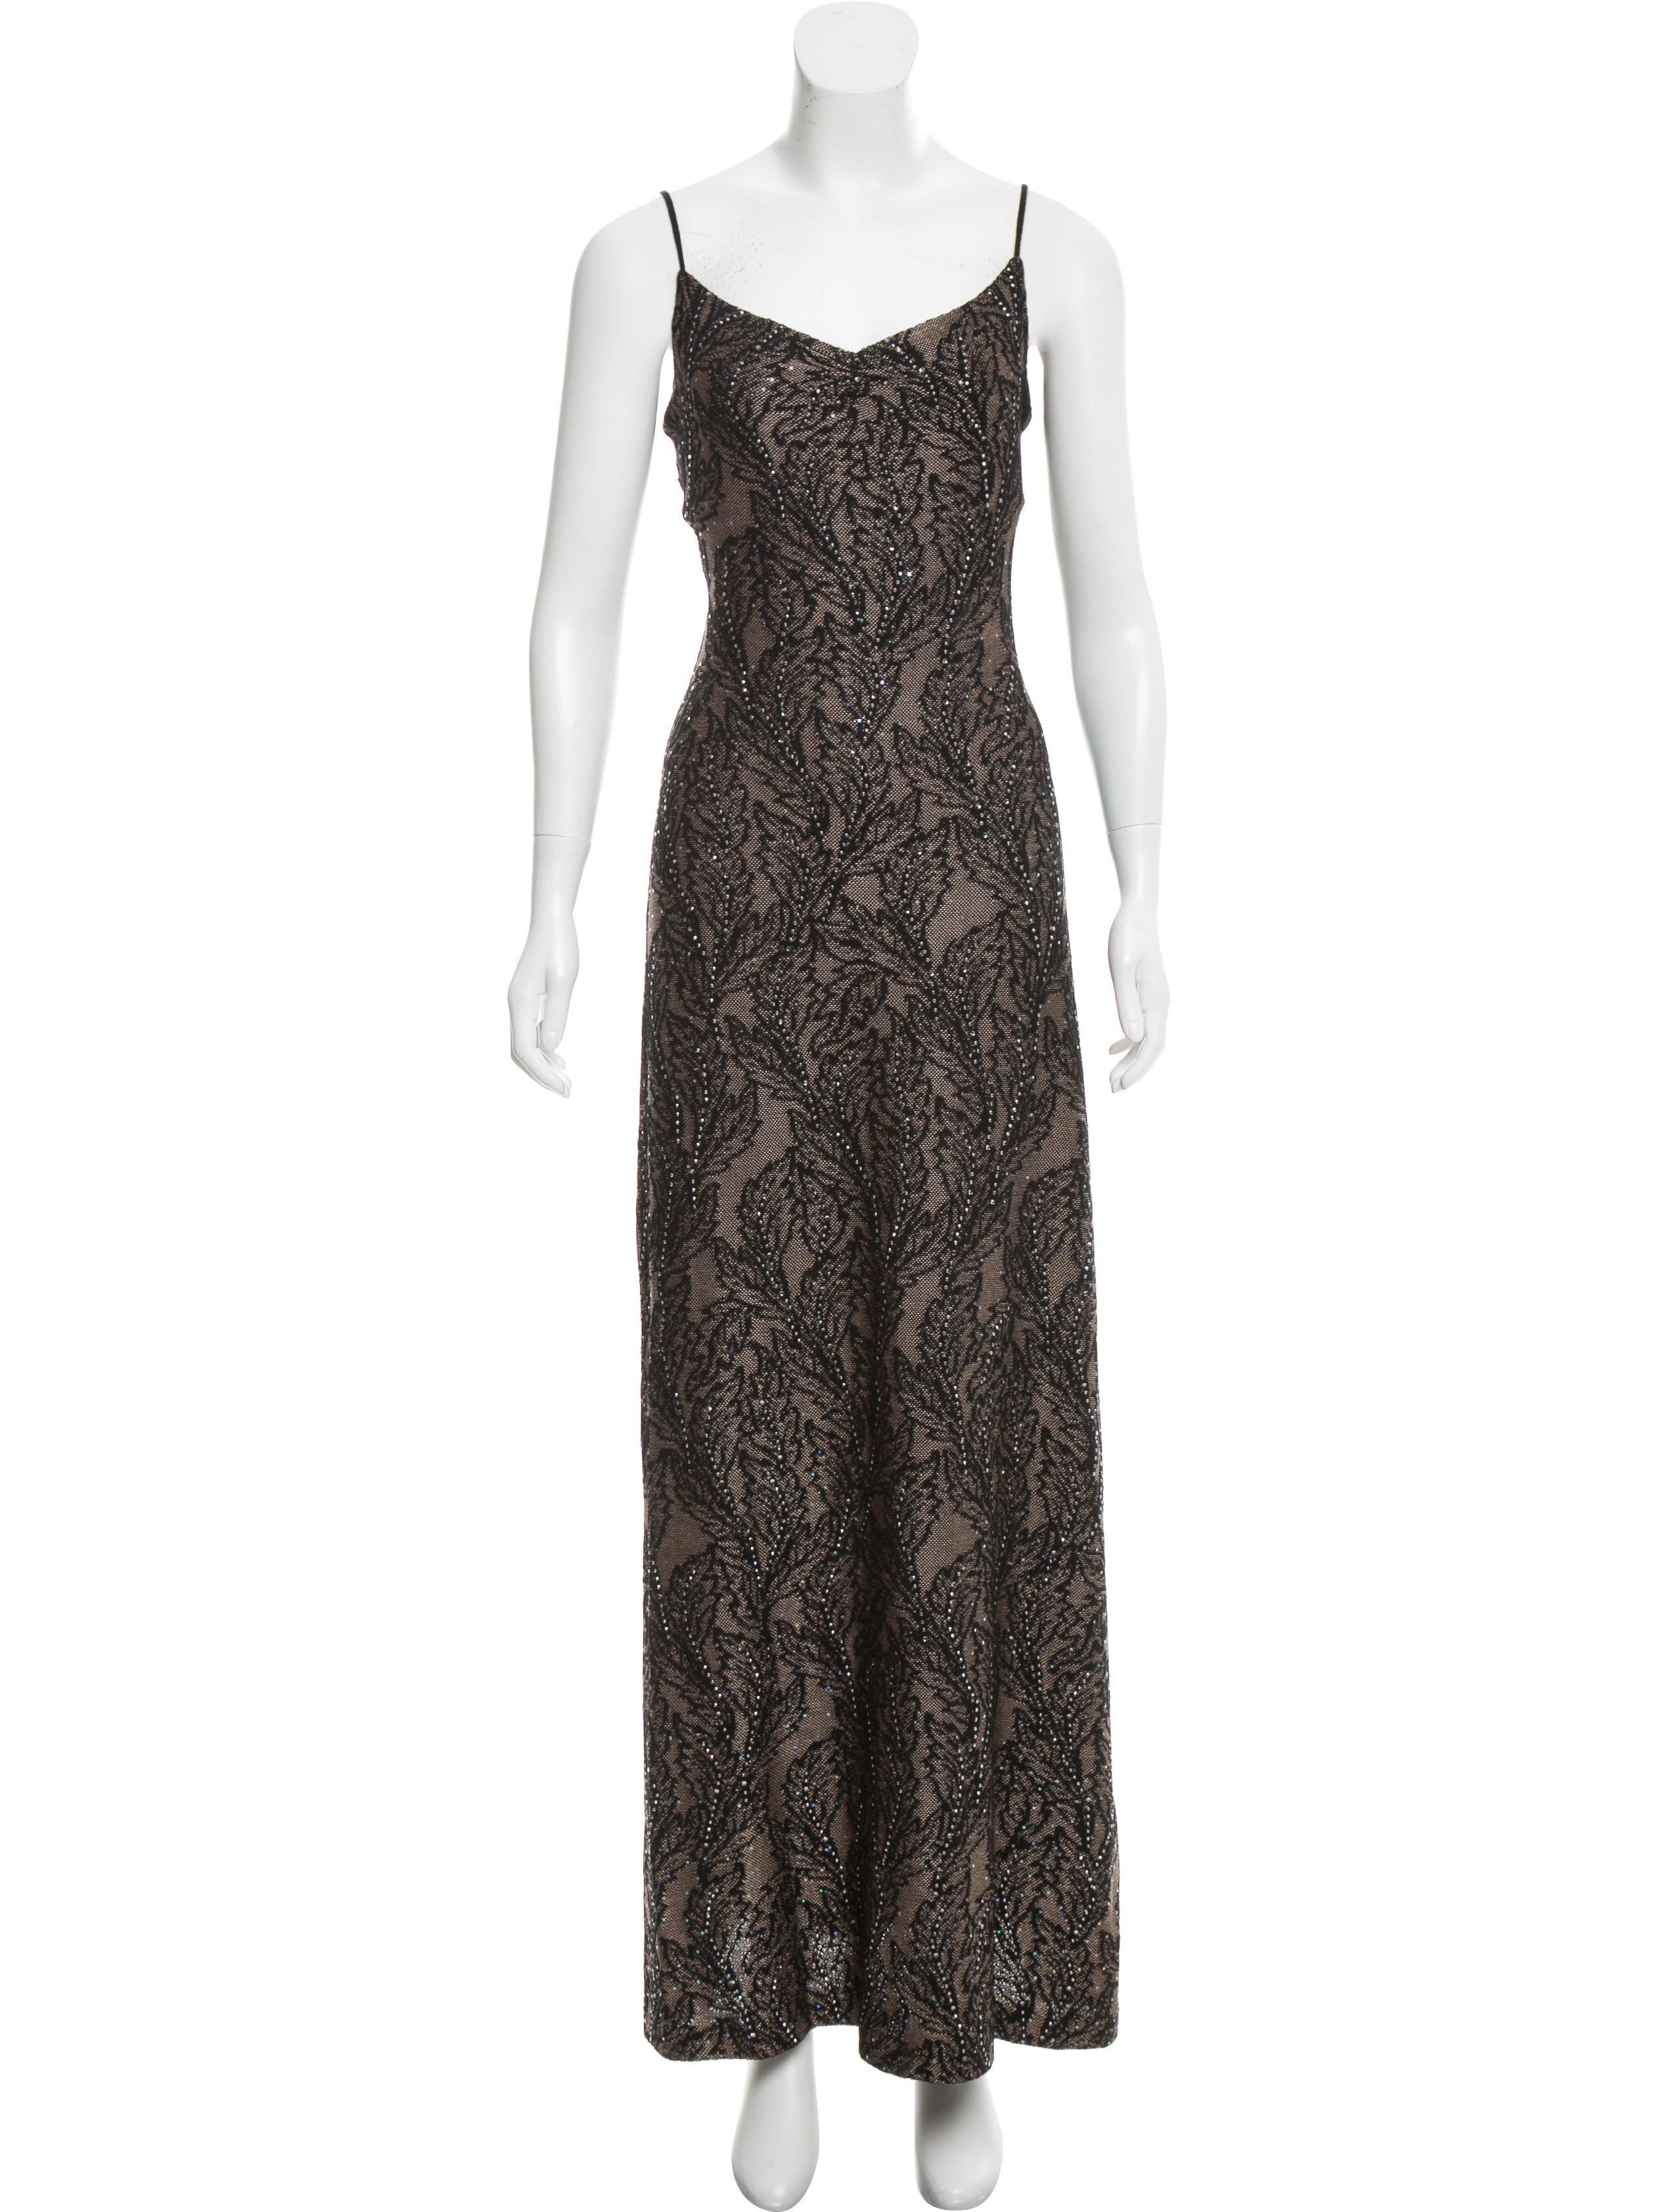 St. John Embellished Evening Dress - Clothing - STJ21394 | The RealReal